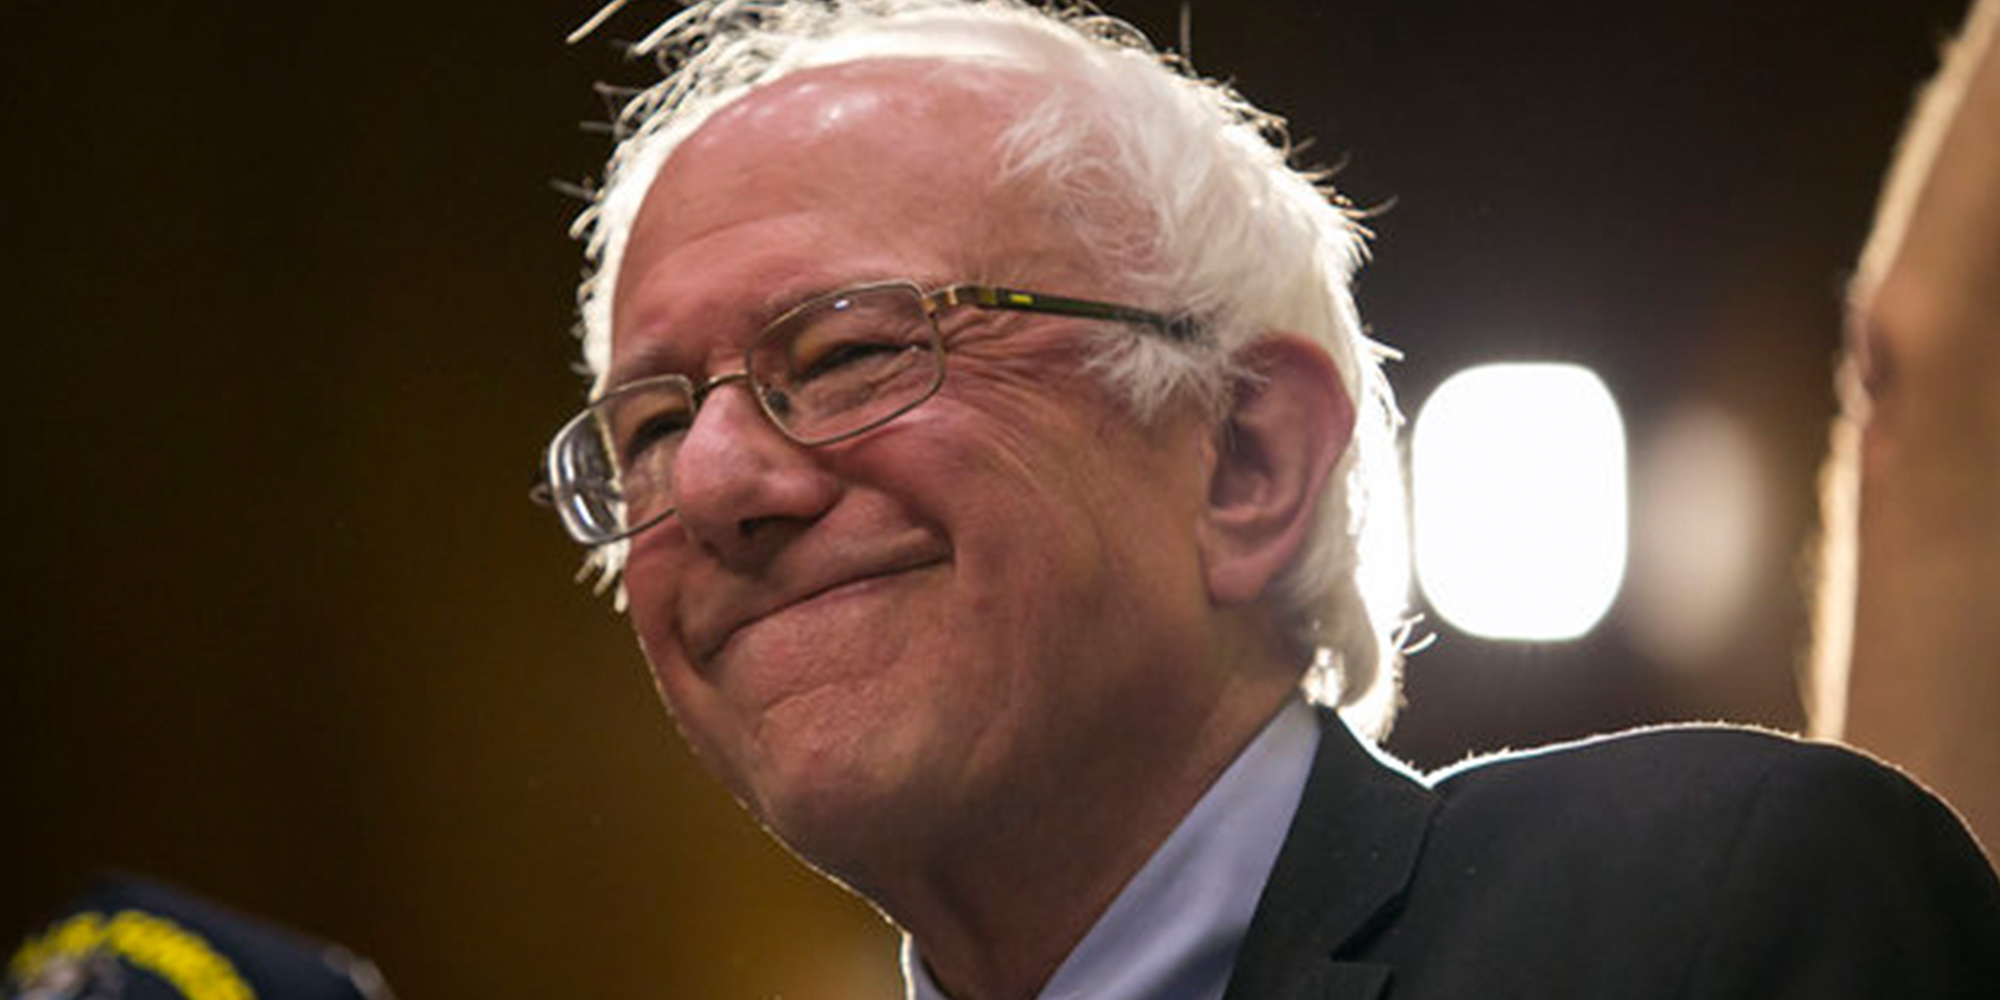 Bernie Nabs Two More Major Endorsements – Thom Hartmann's Big Picture